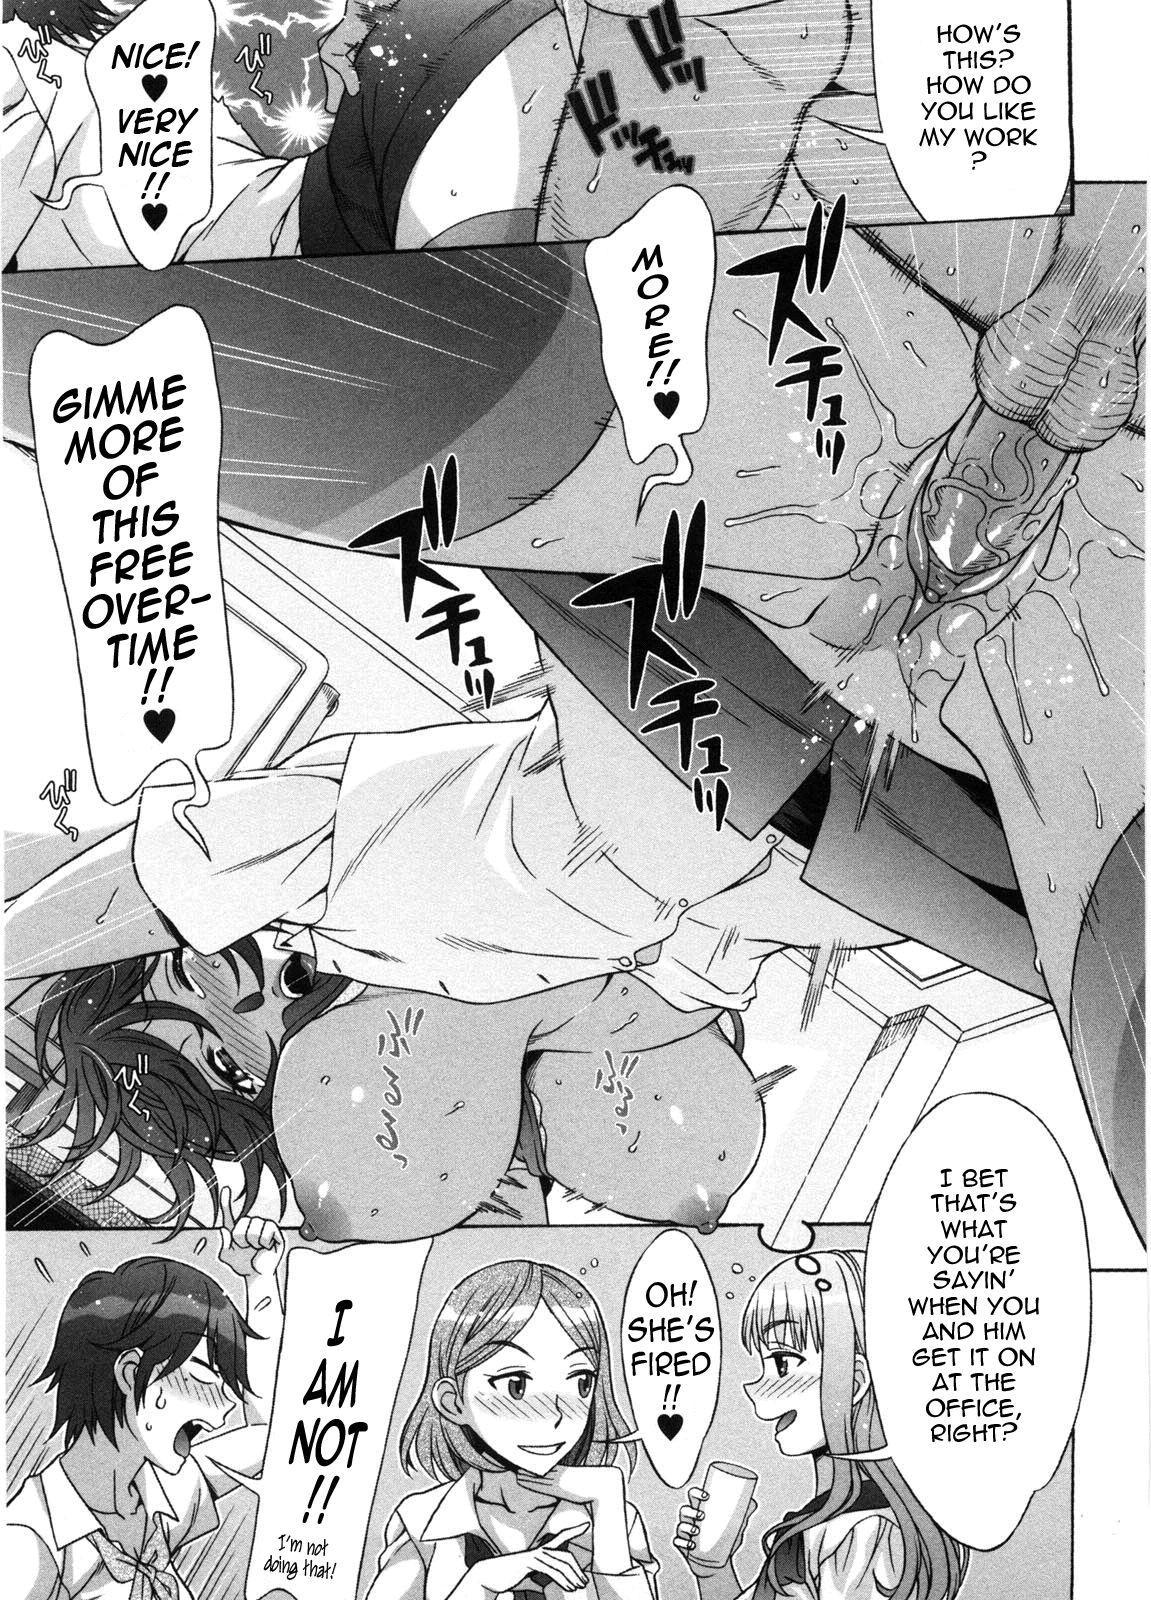 [Hanzaki Jirou] Ama Ero - Sweet Sugar Baby Ch. 1-7 [English] [Tadanohito] [Decensored] 69